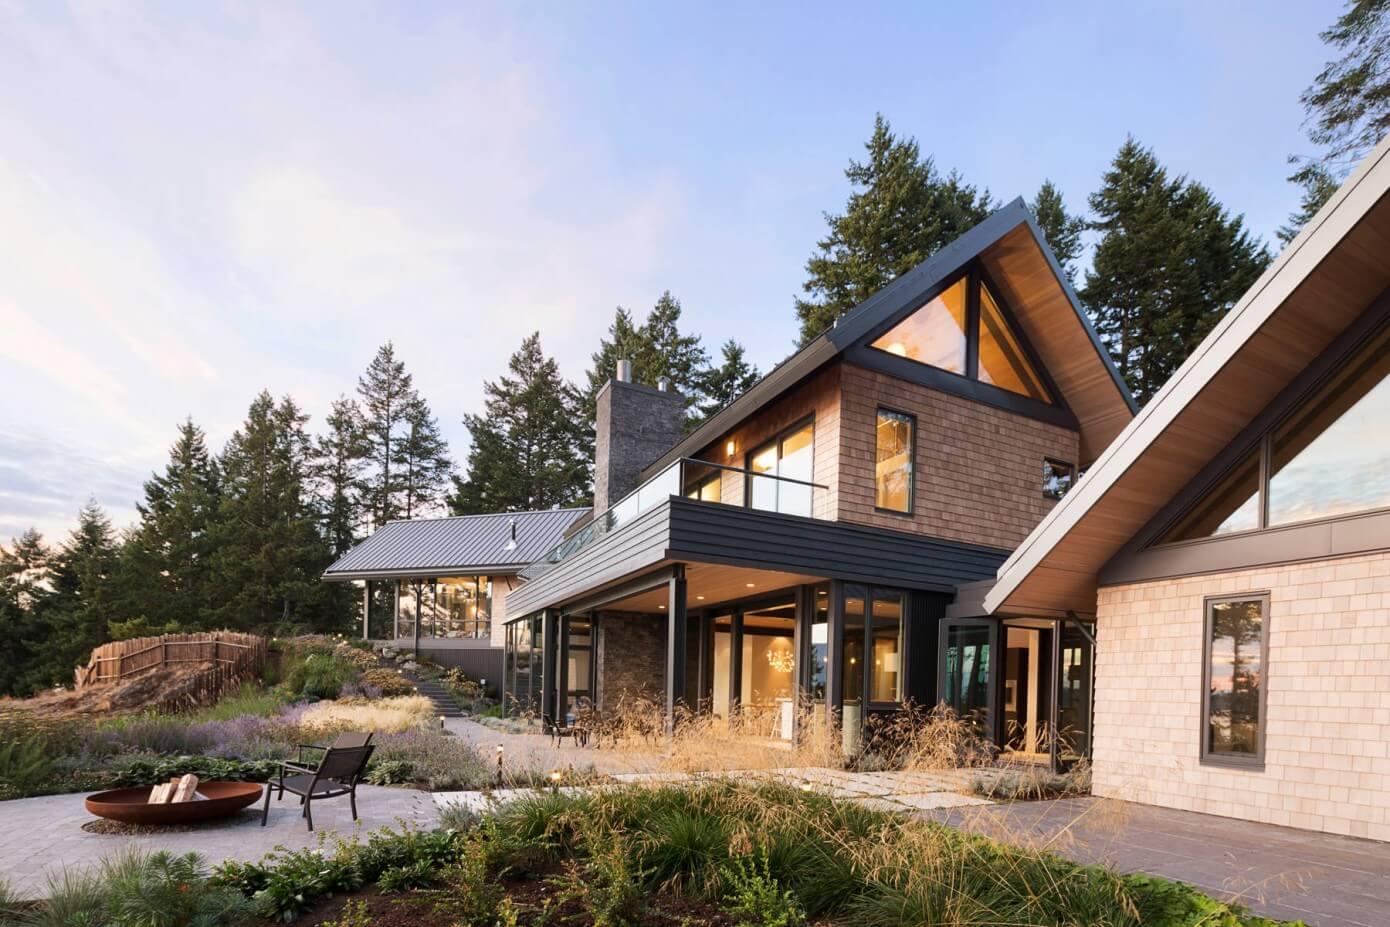 002-collingwood-residence-frits-de-vries-architect-1390x927.jpg